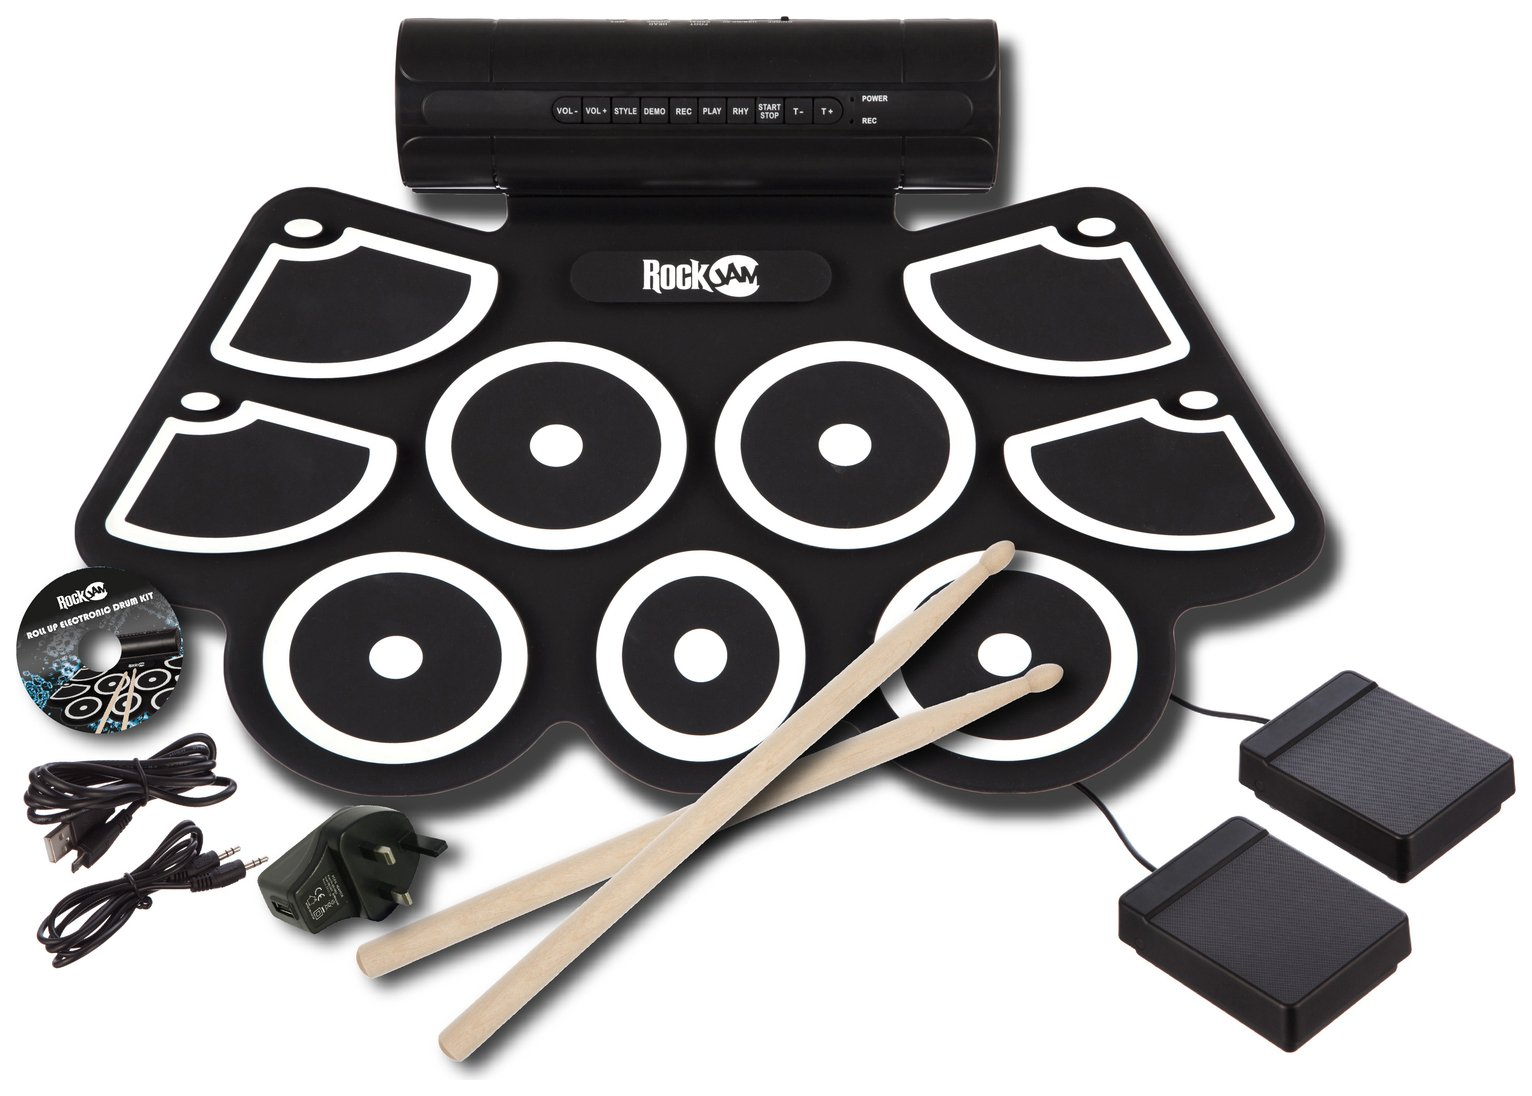 RockJam Rollup Drum Kit